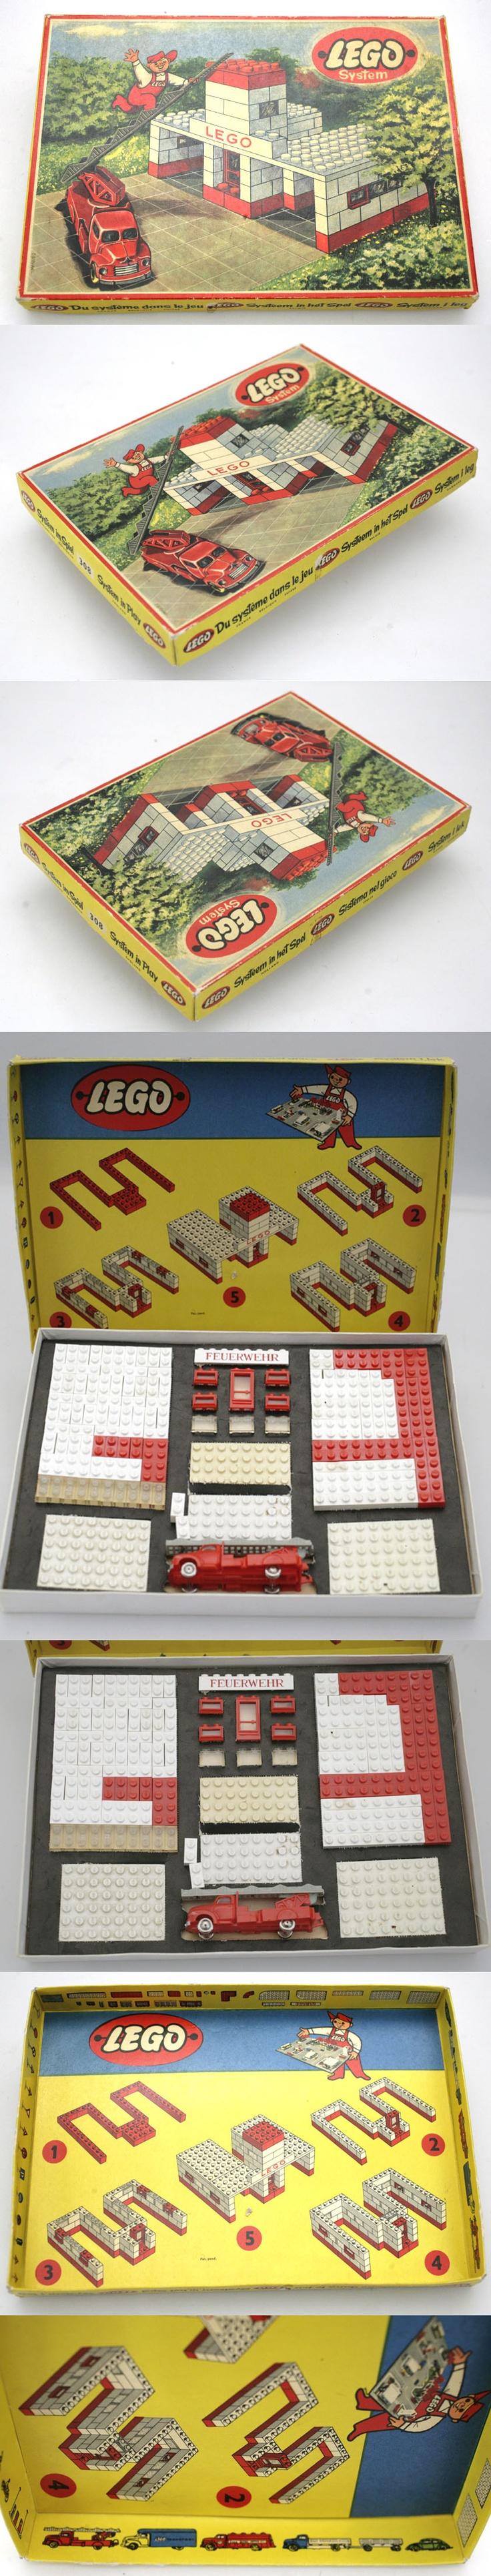 1950's LEGO SET 308 NOW ONLINE FOR SALE AT EBAY.DE